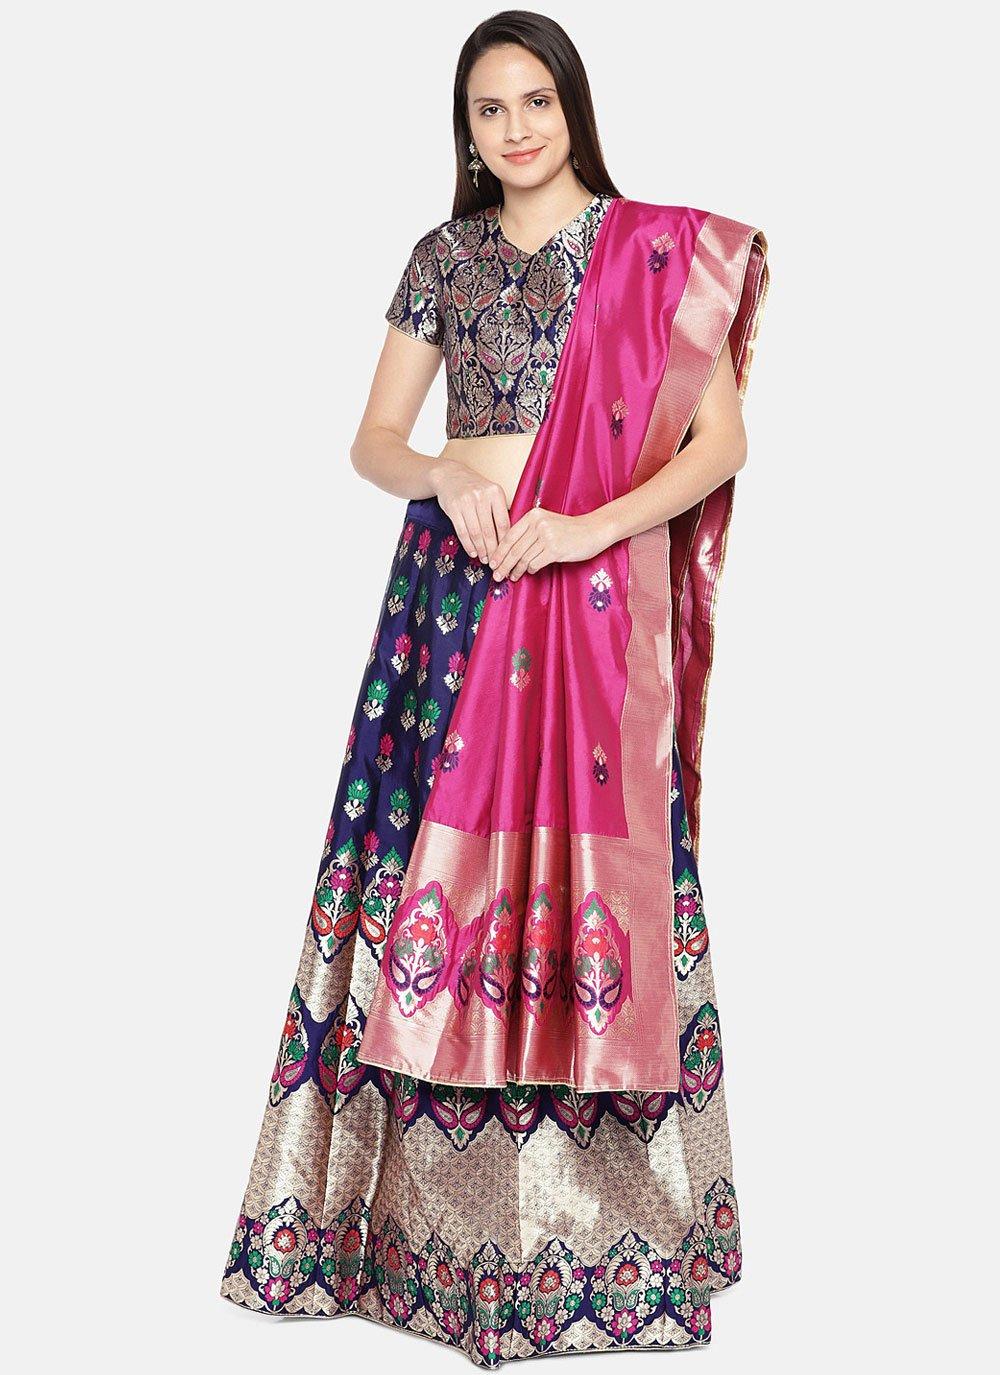 Banarasi Silk Woven Lehenga Choli in Blue